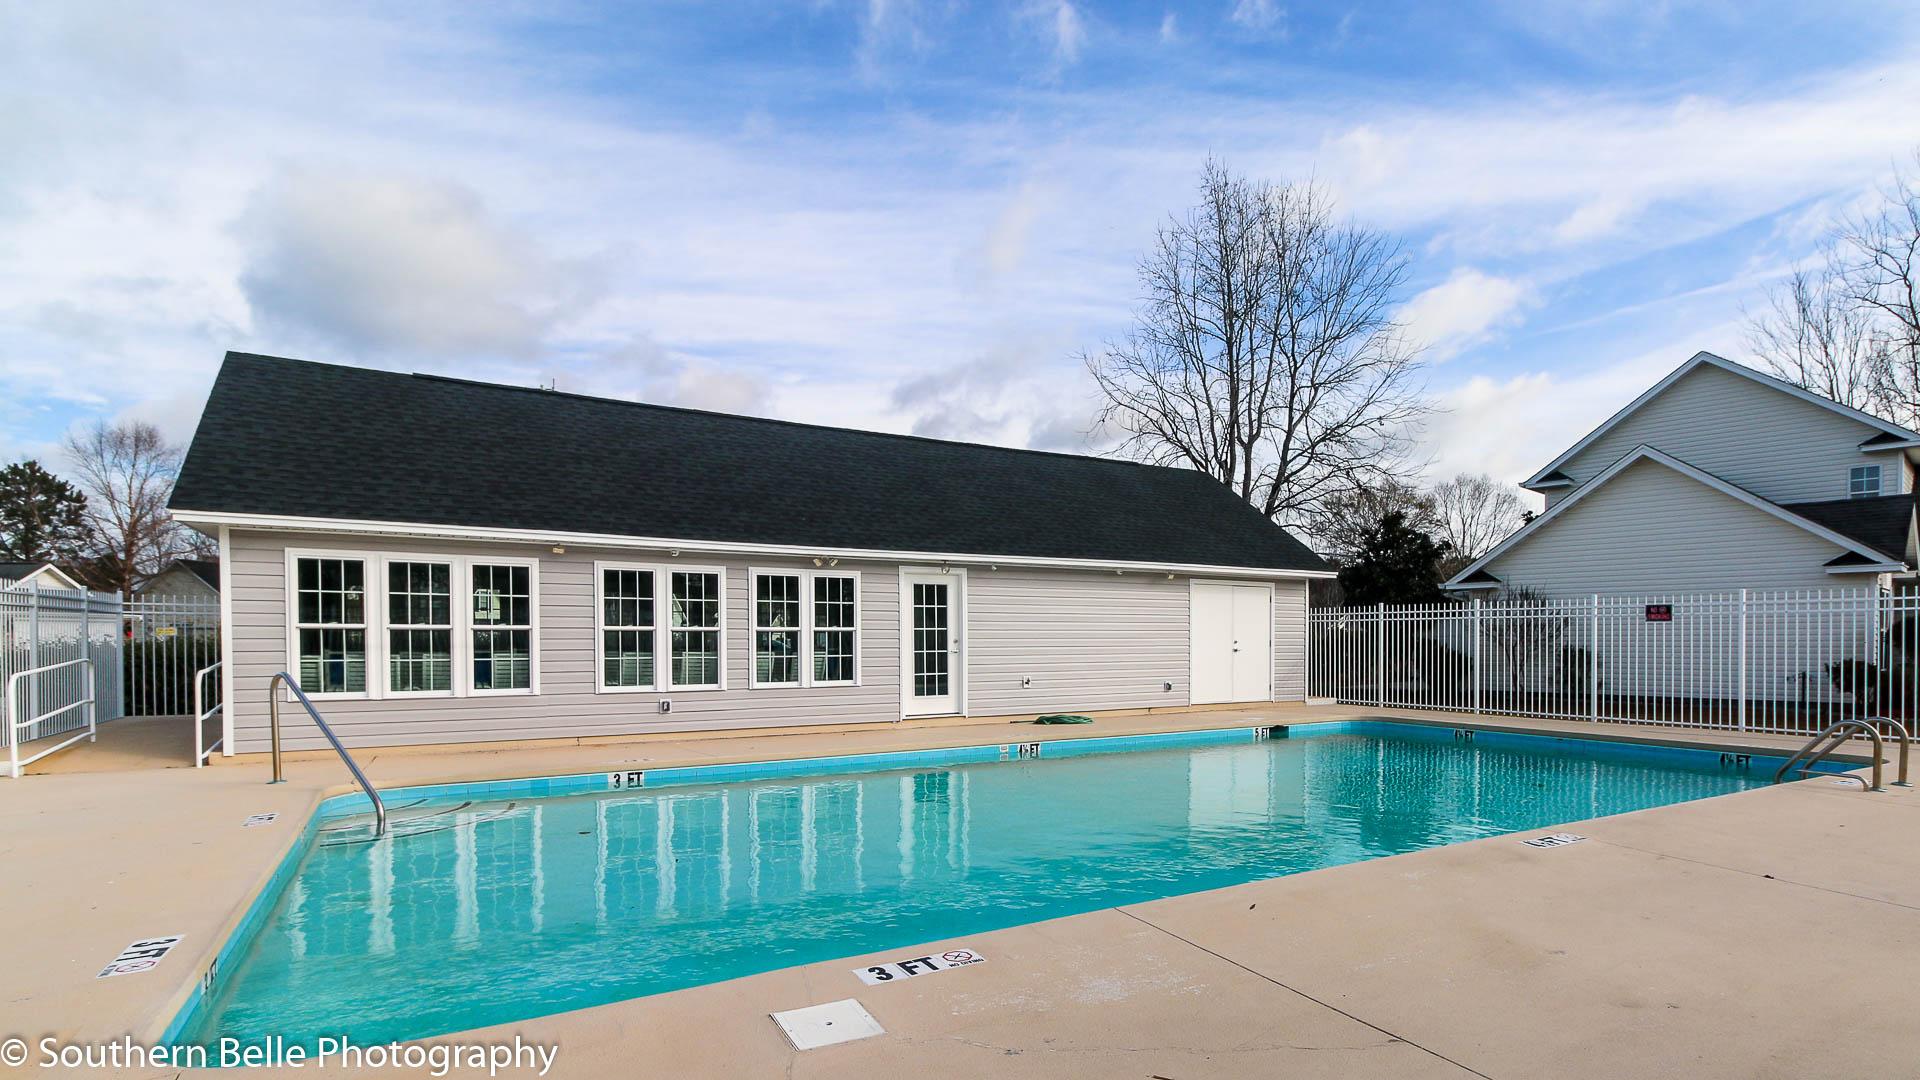 29. Community Pool WM